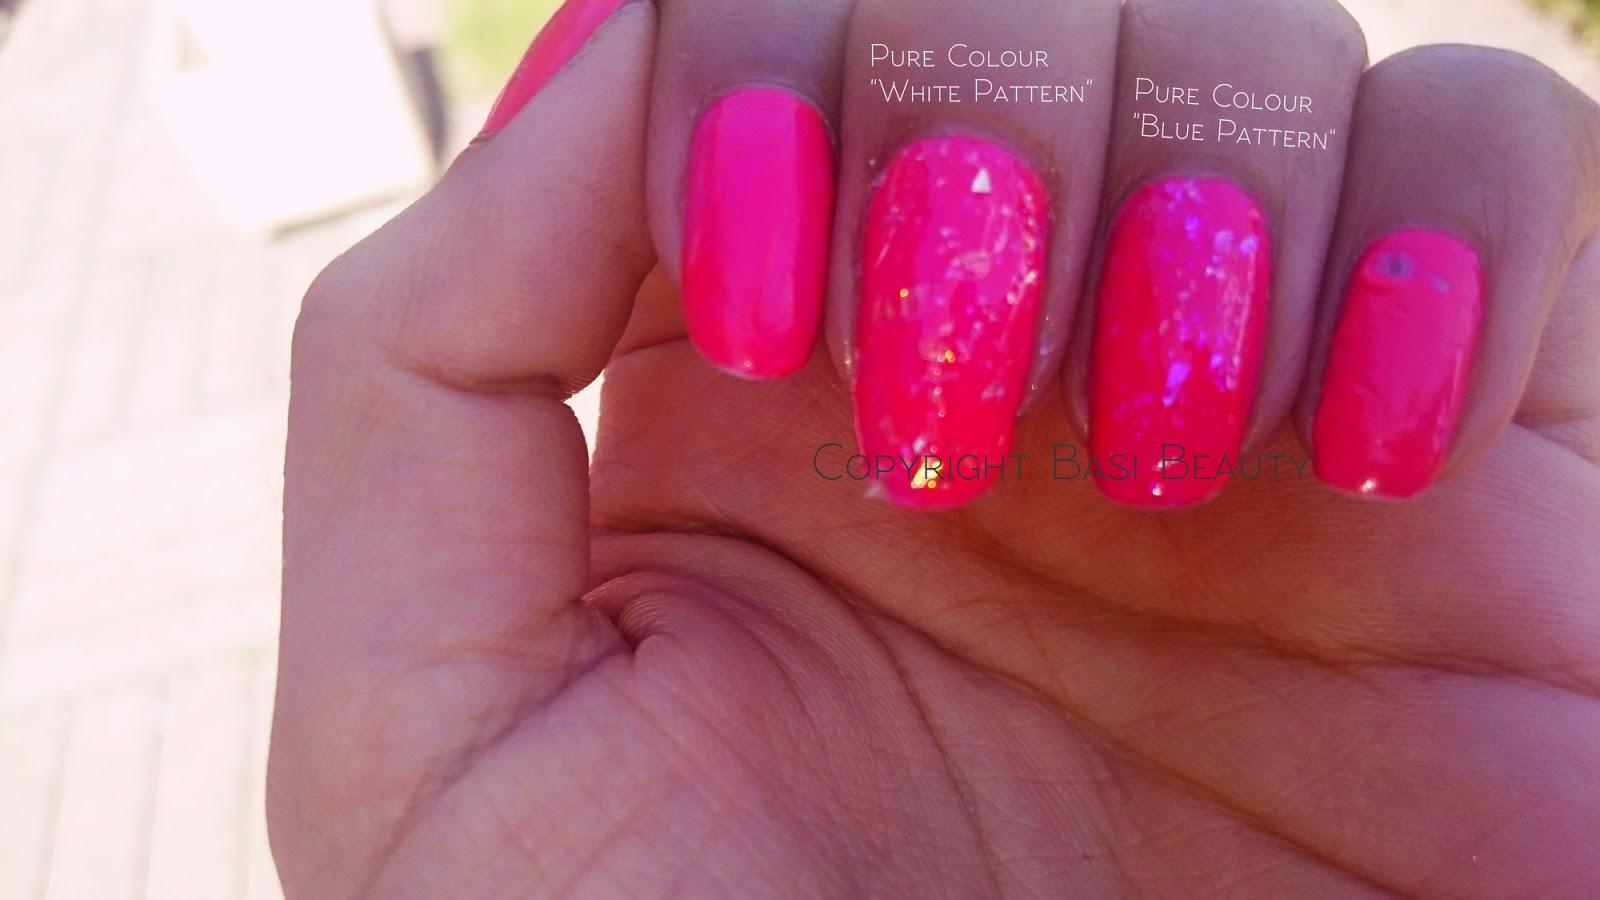 Newlook Pure Colour Makeup = Duplicates of MAC and Illamasqua